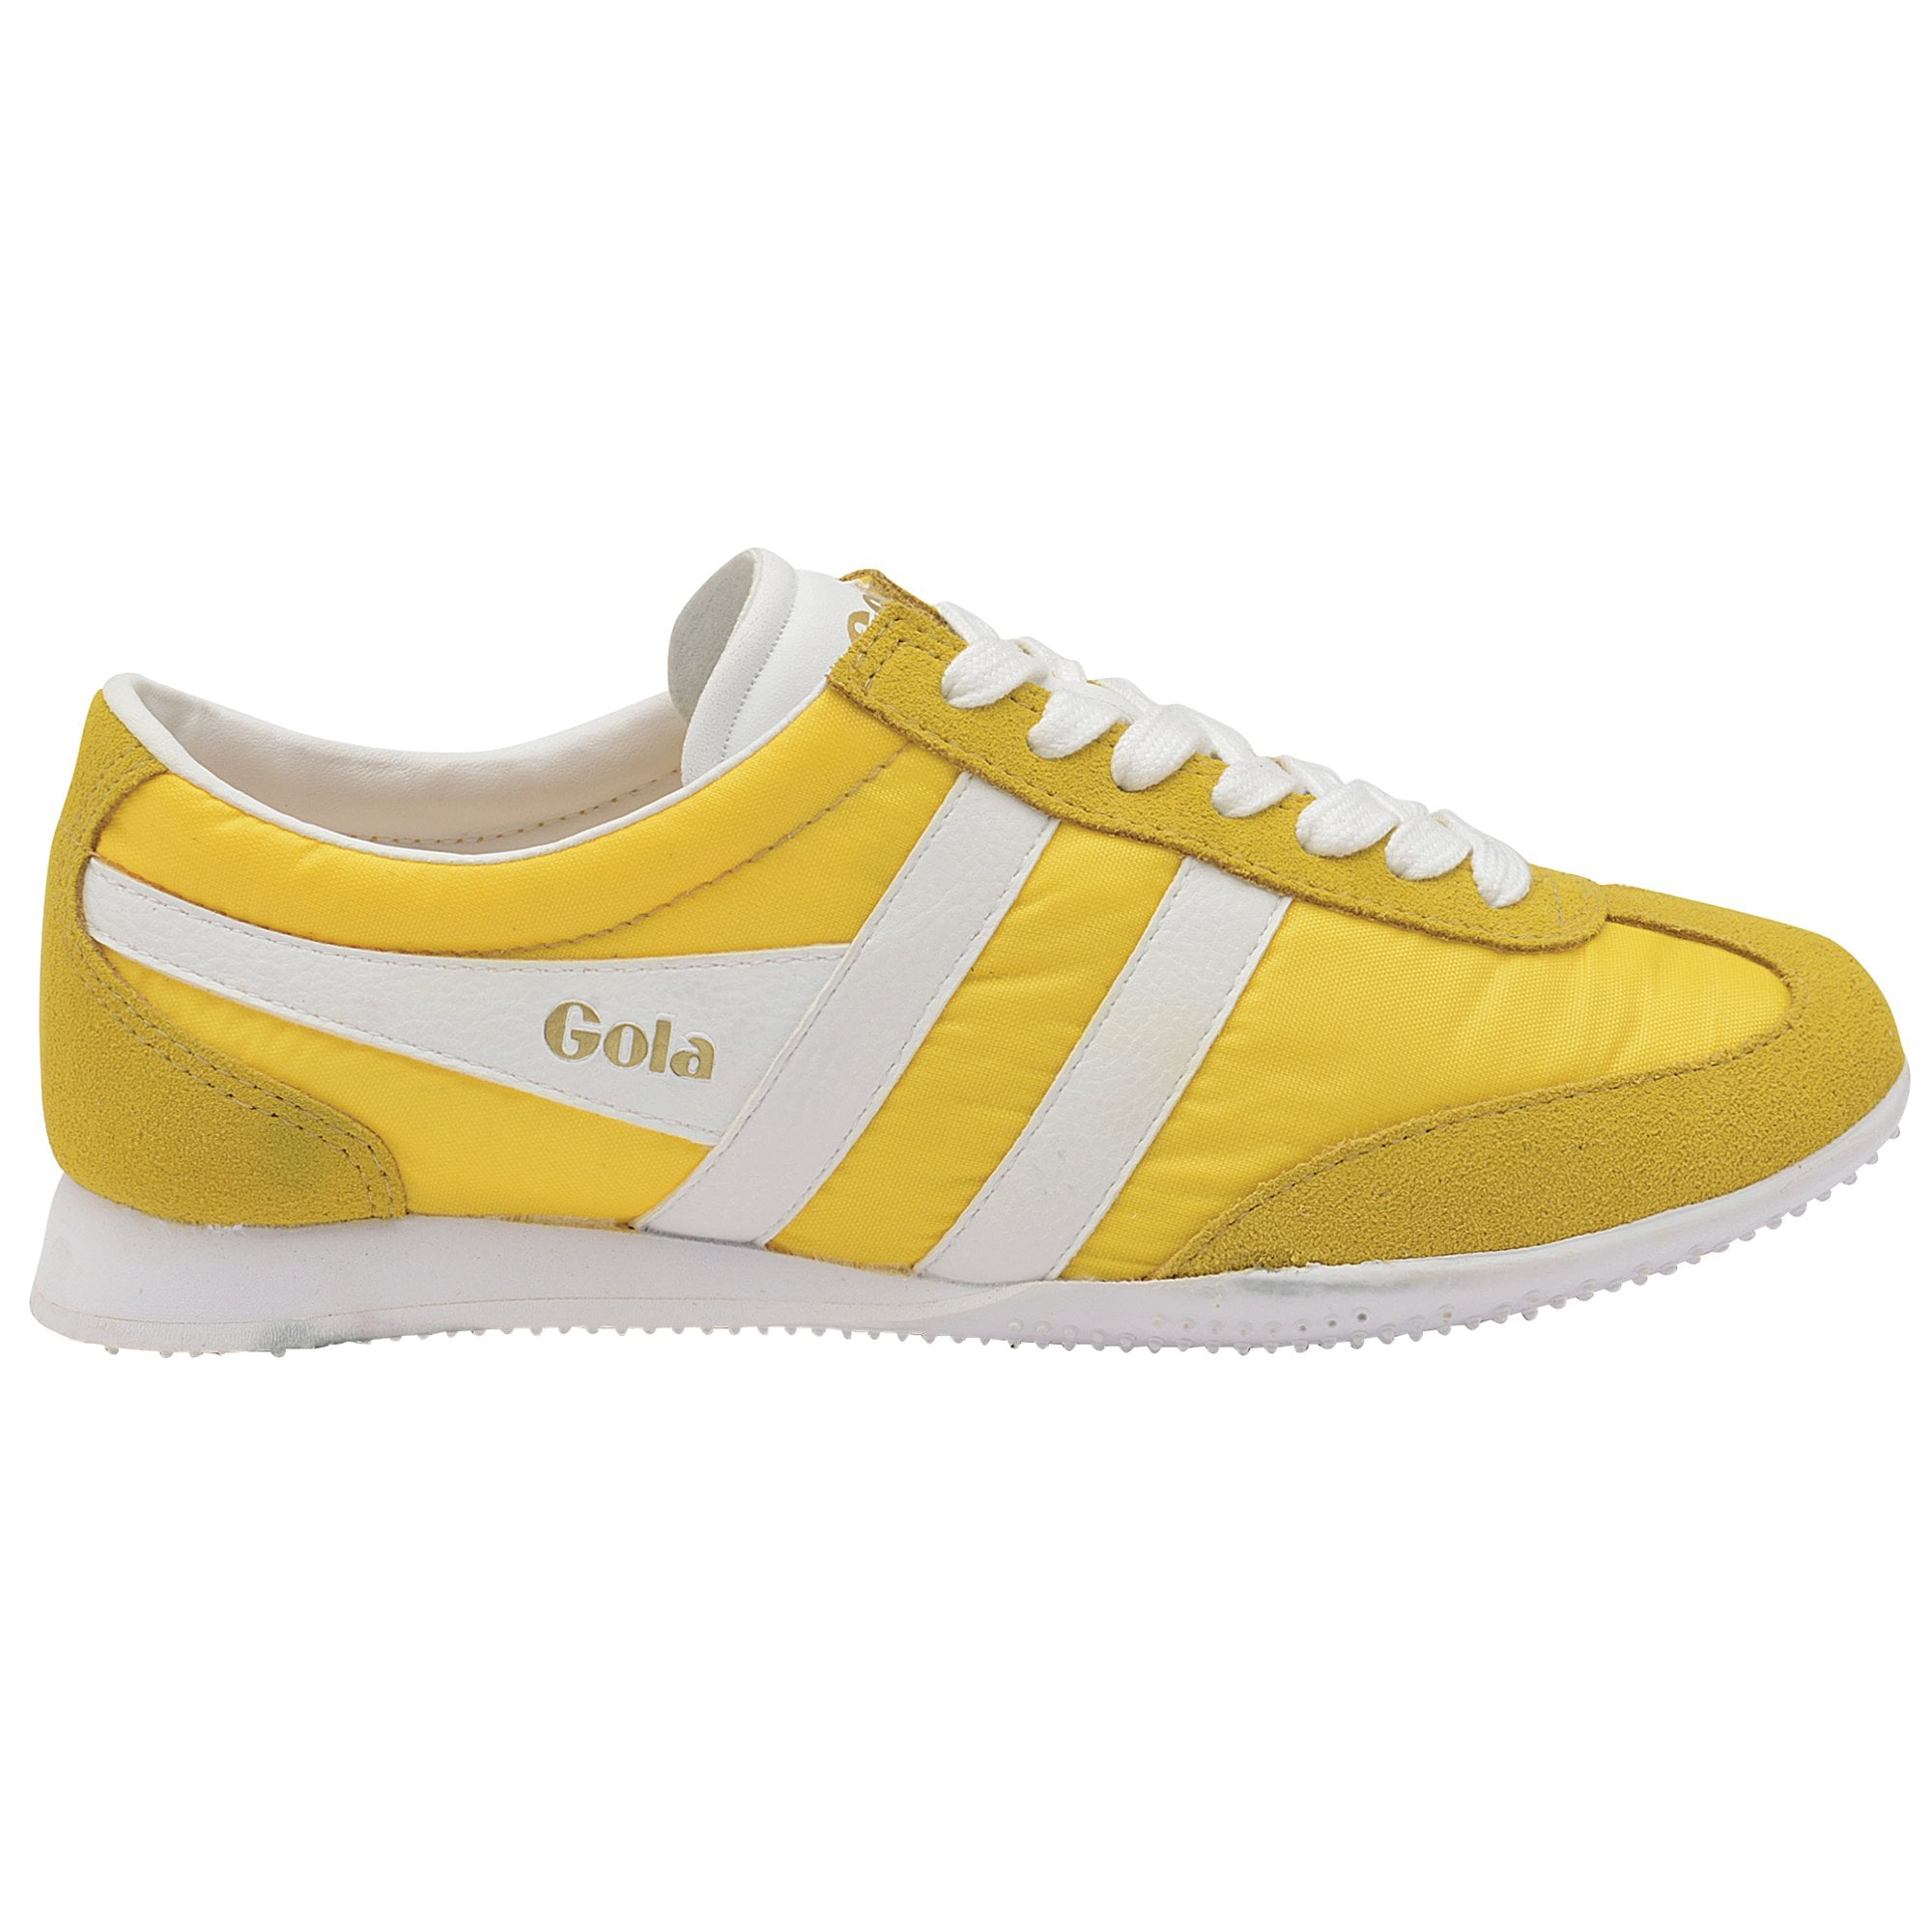 Buy Gola womens Wasp sneaker online